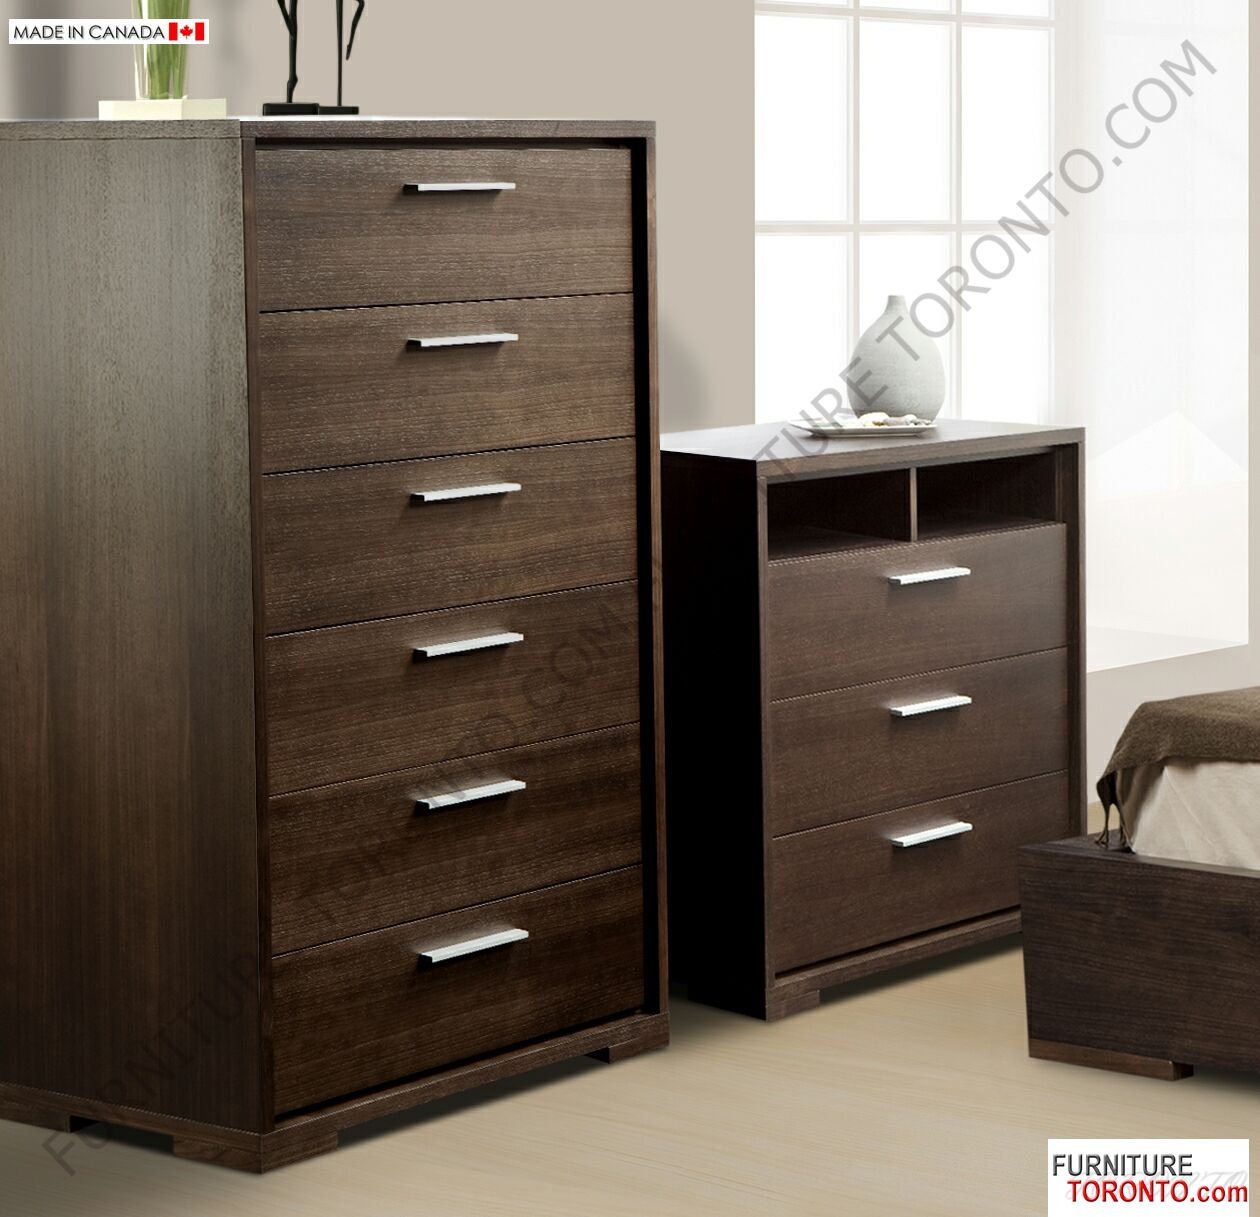 Furniture toronto official website furniture retail Bedroom furniture toronto